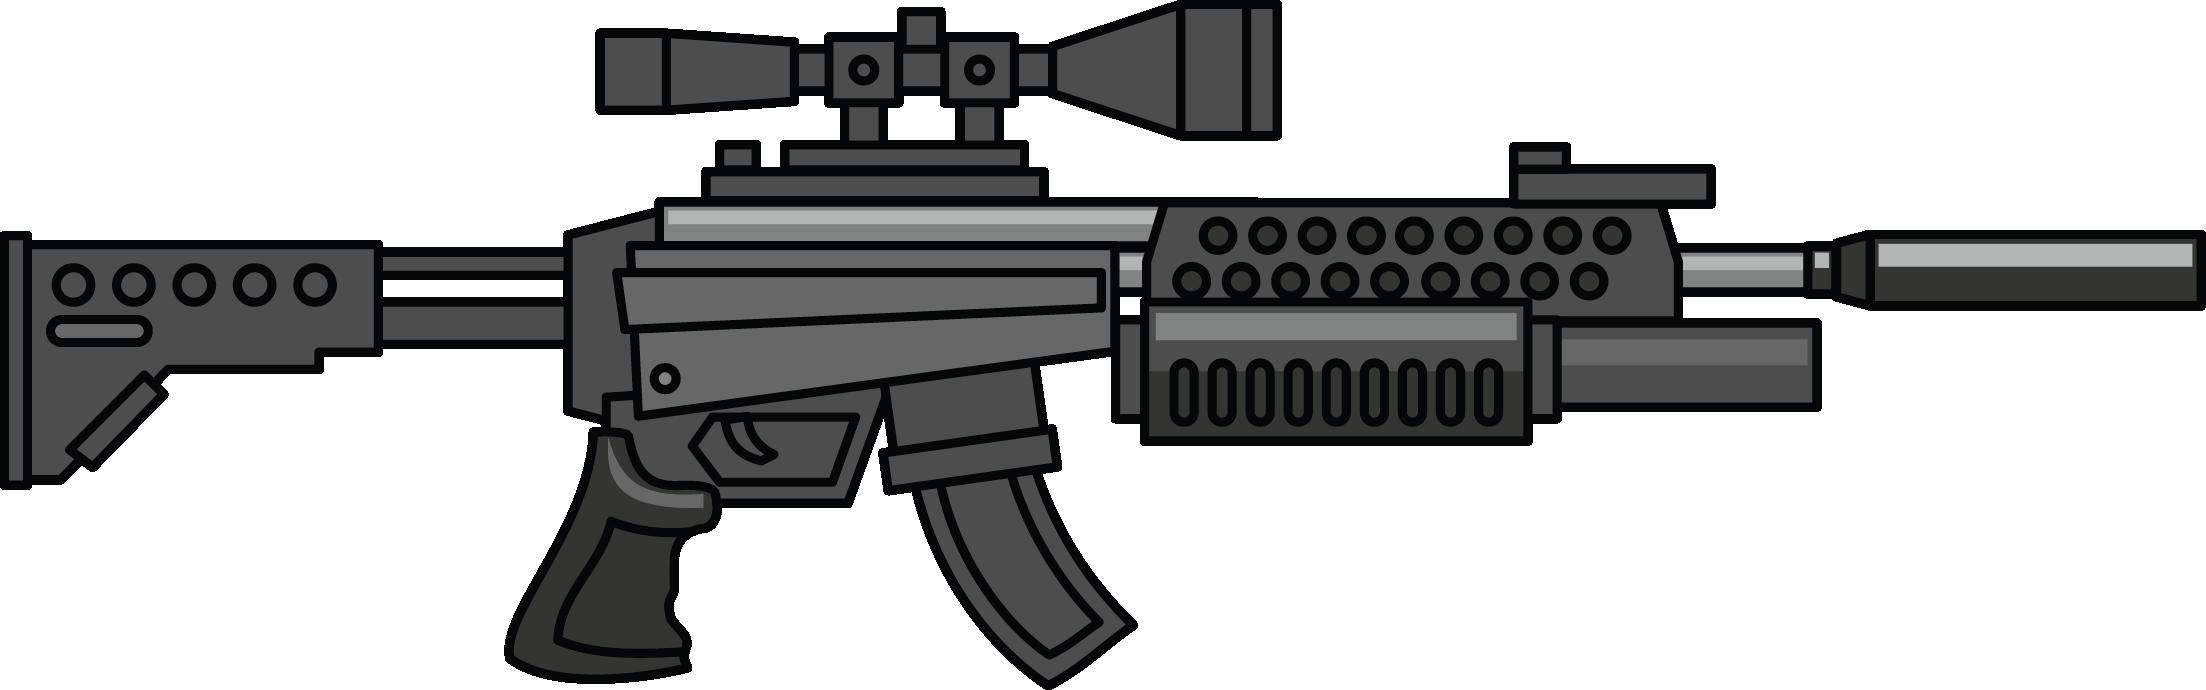 Machine Gun Clip Art.